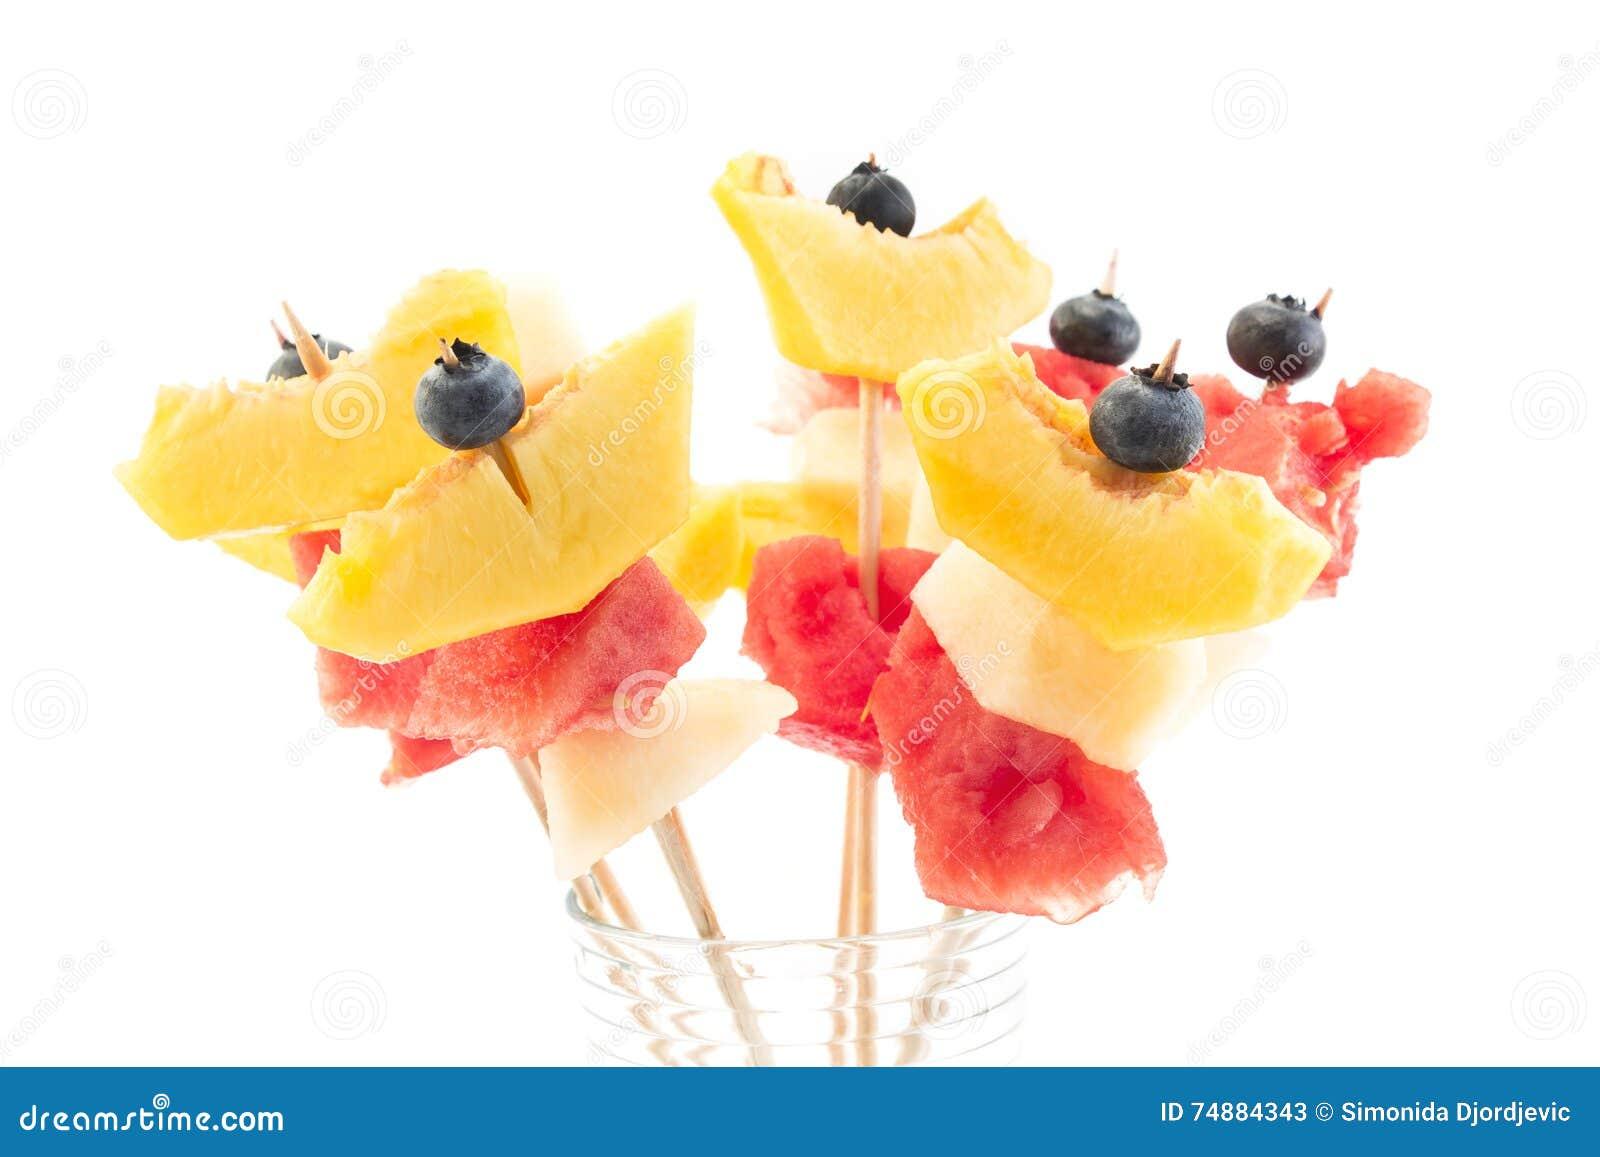 Espetos de refrescamento do fruto - petisco do fruto